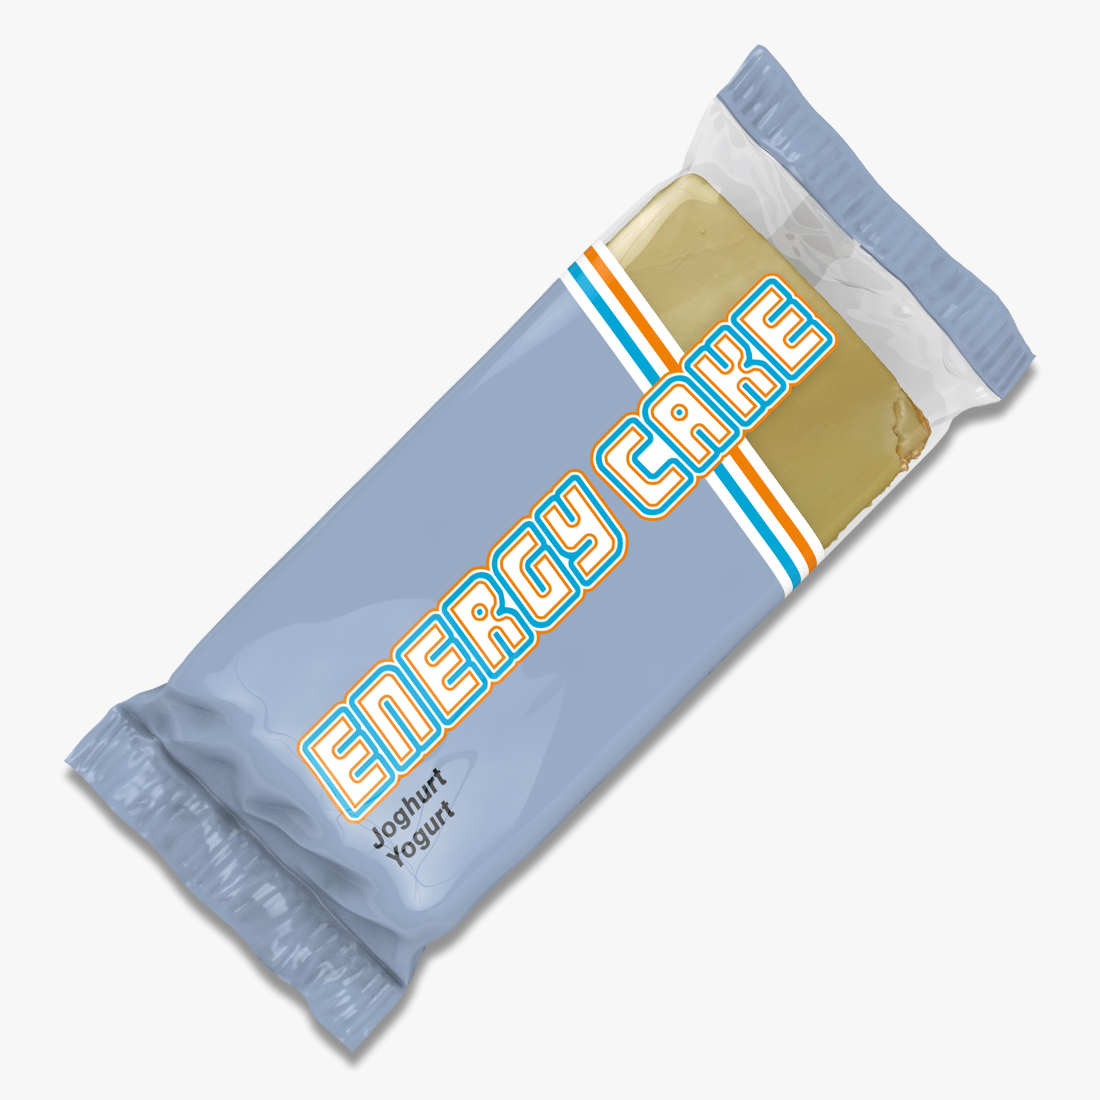 Energy Cake - Energy Cake